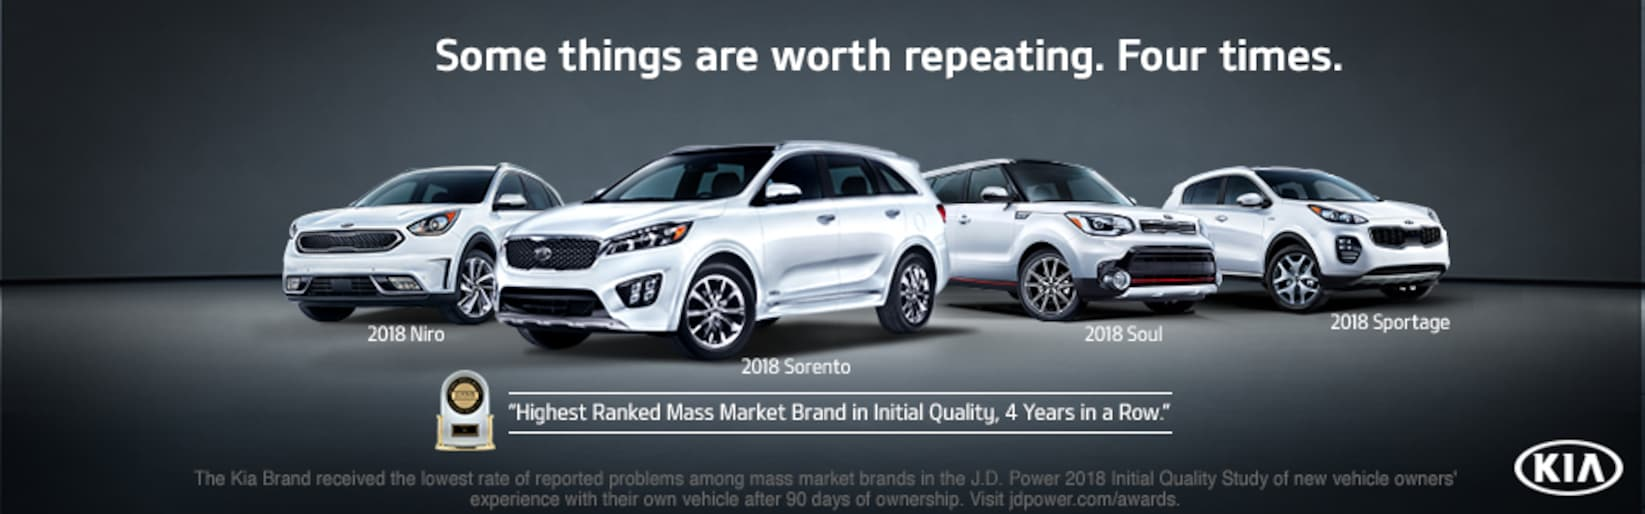 Jp Thibodeaux Honda >> J.P. Thibodeaux Group | New Kia, Honda, Nissan Dealership in New Iberia, LA